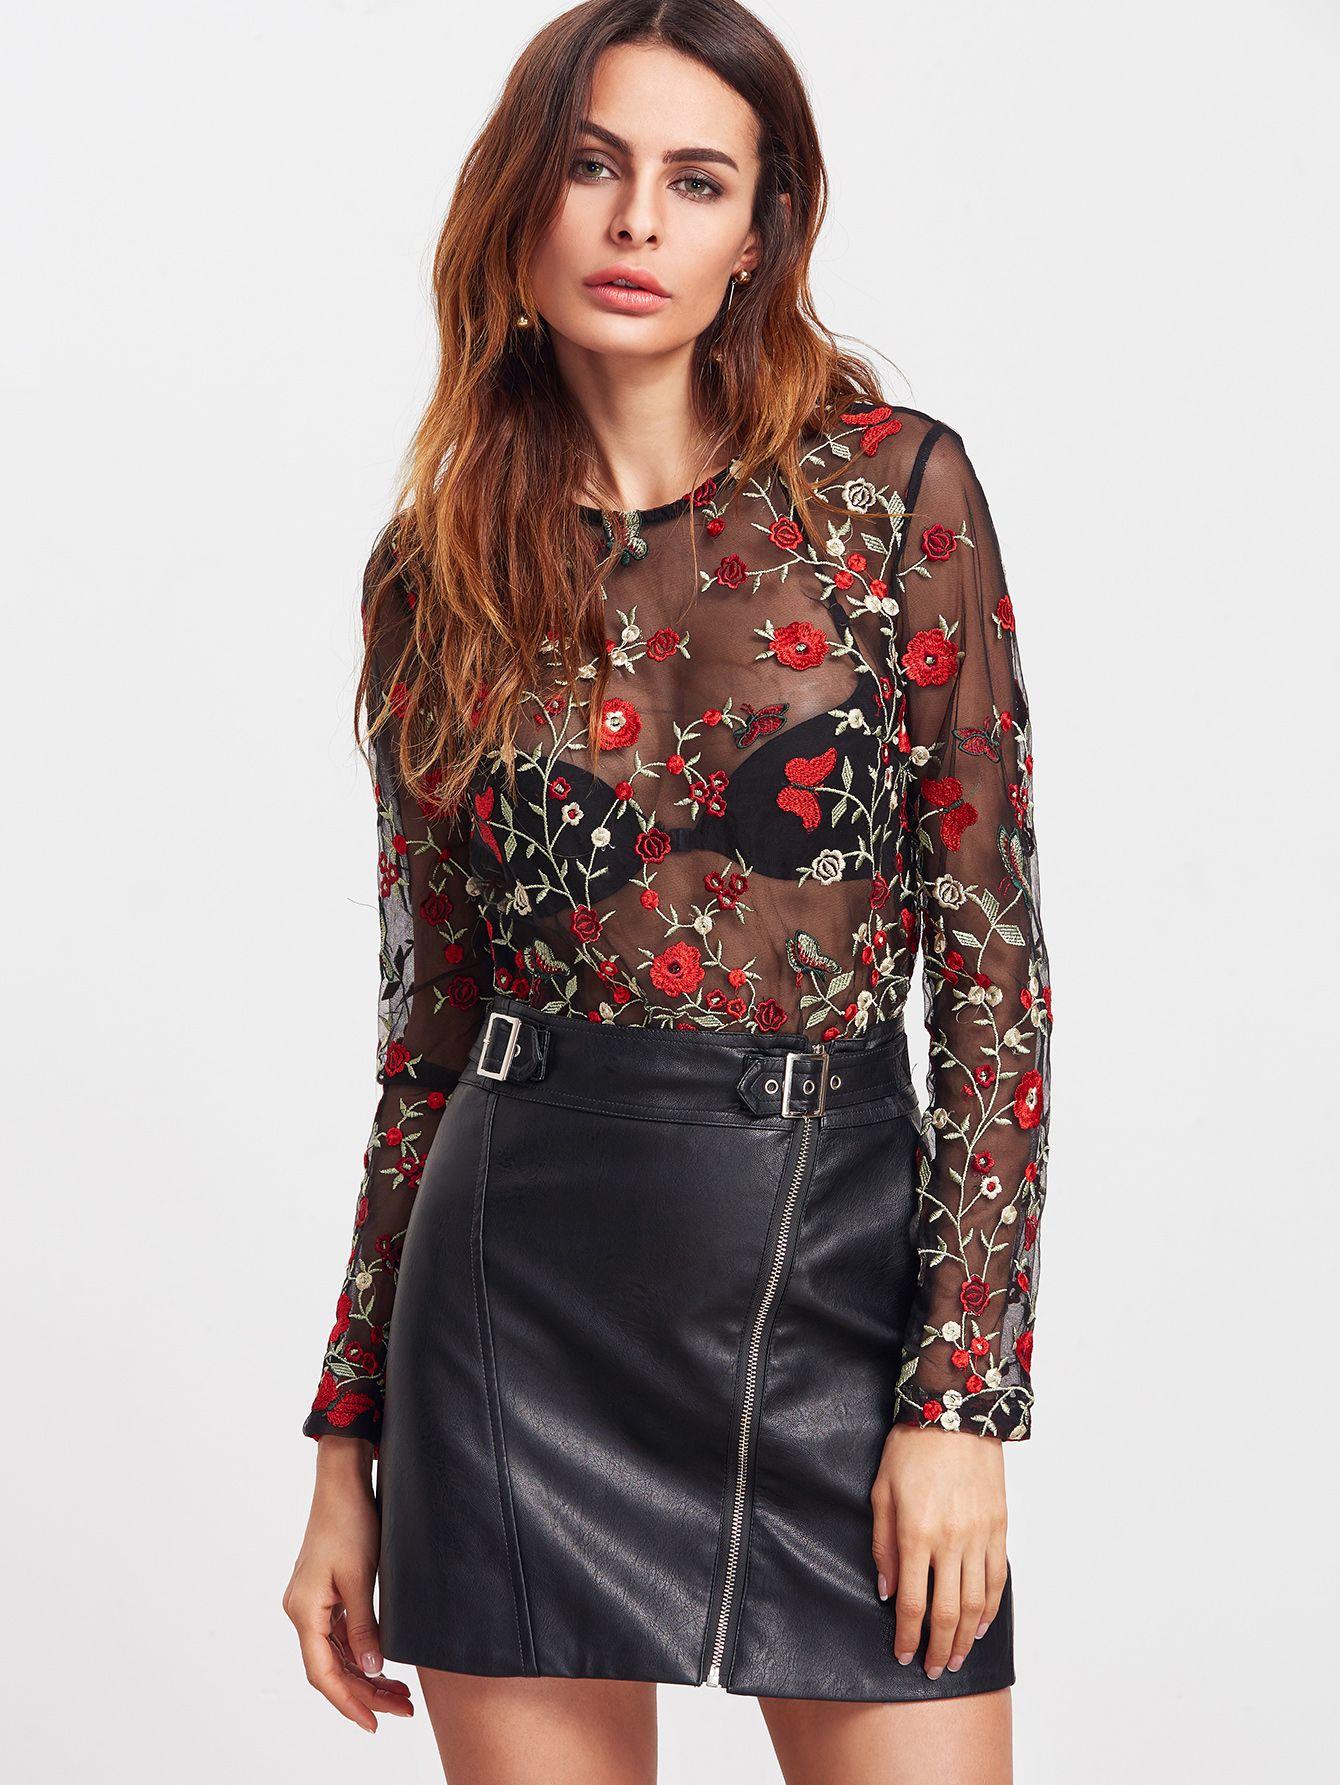 71e7d1bef72ba Shop Black Flower Embroidered Sheer Mesh Bodysuit online. SheIn offers Black  Flower Embroidered Sheer Mesh Bodysuit   more to fit your fashionable needs.